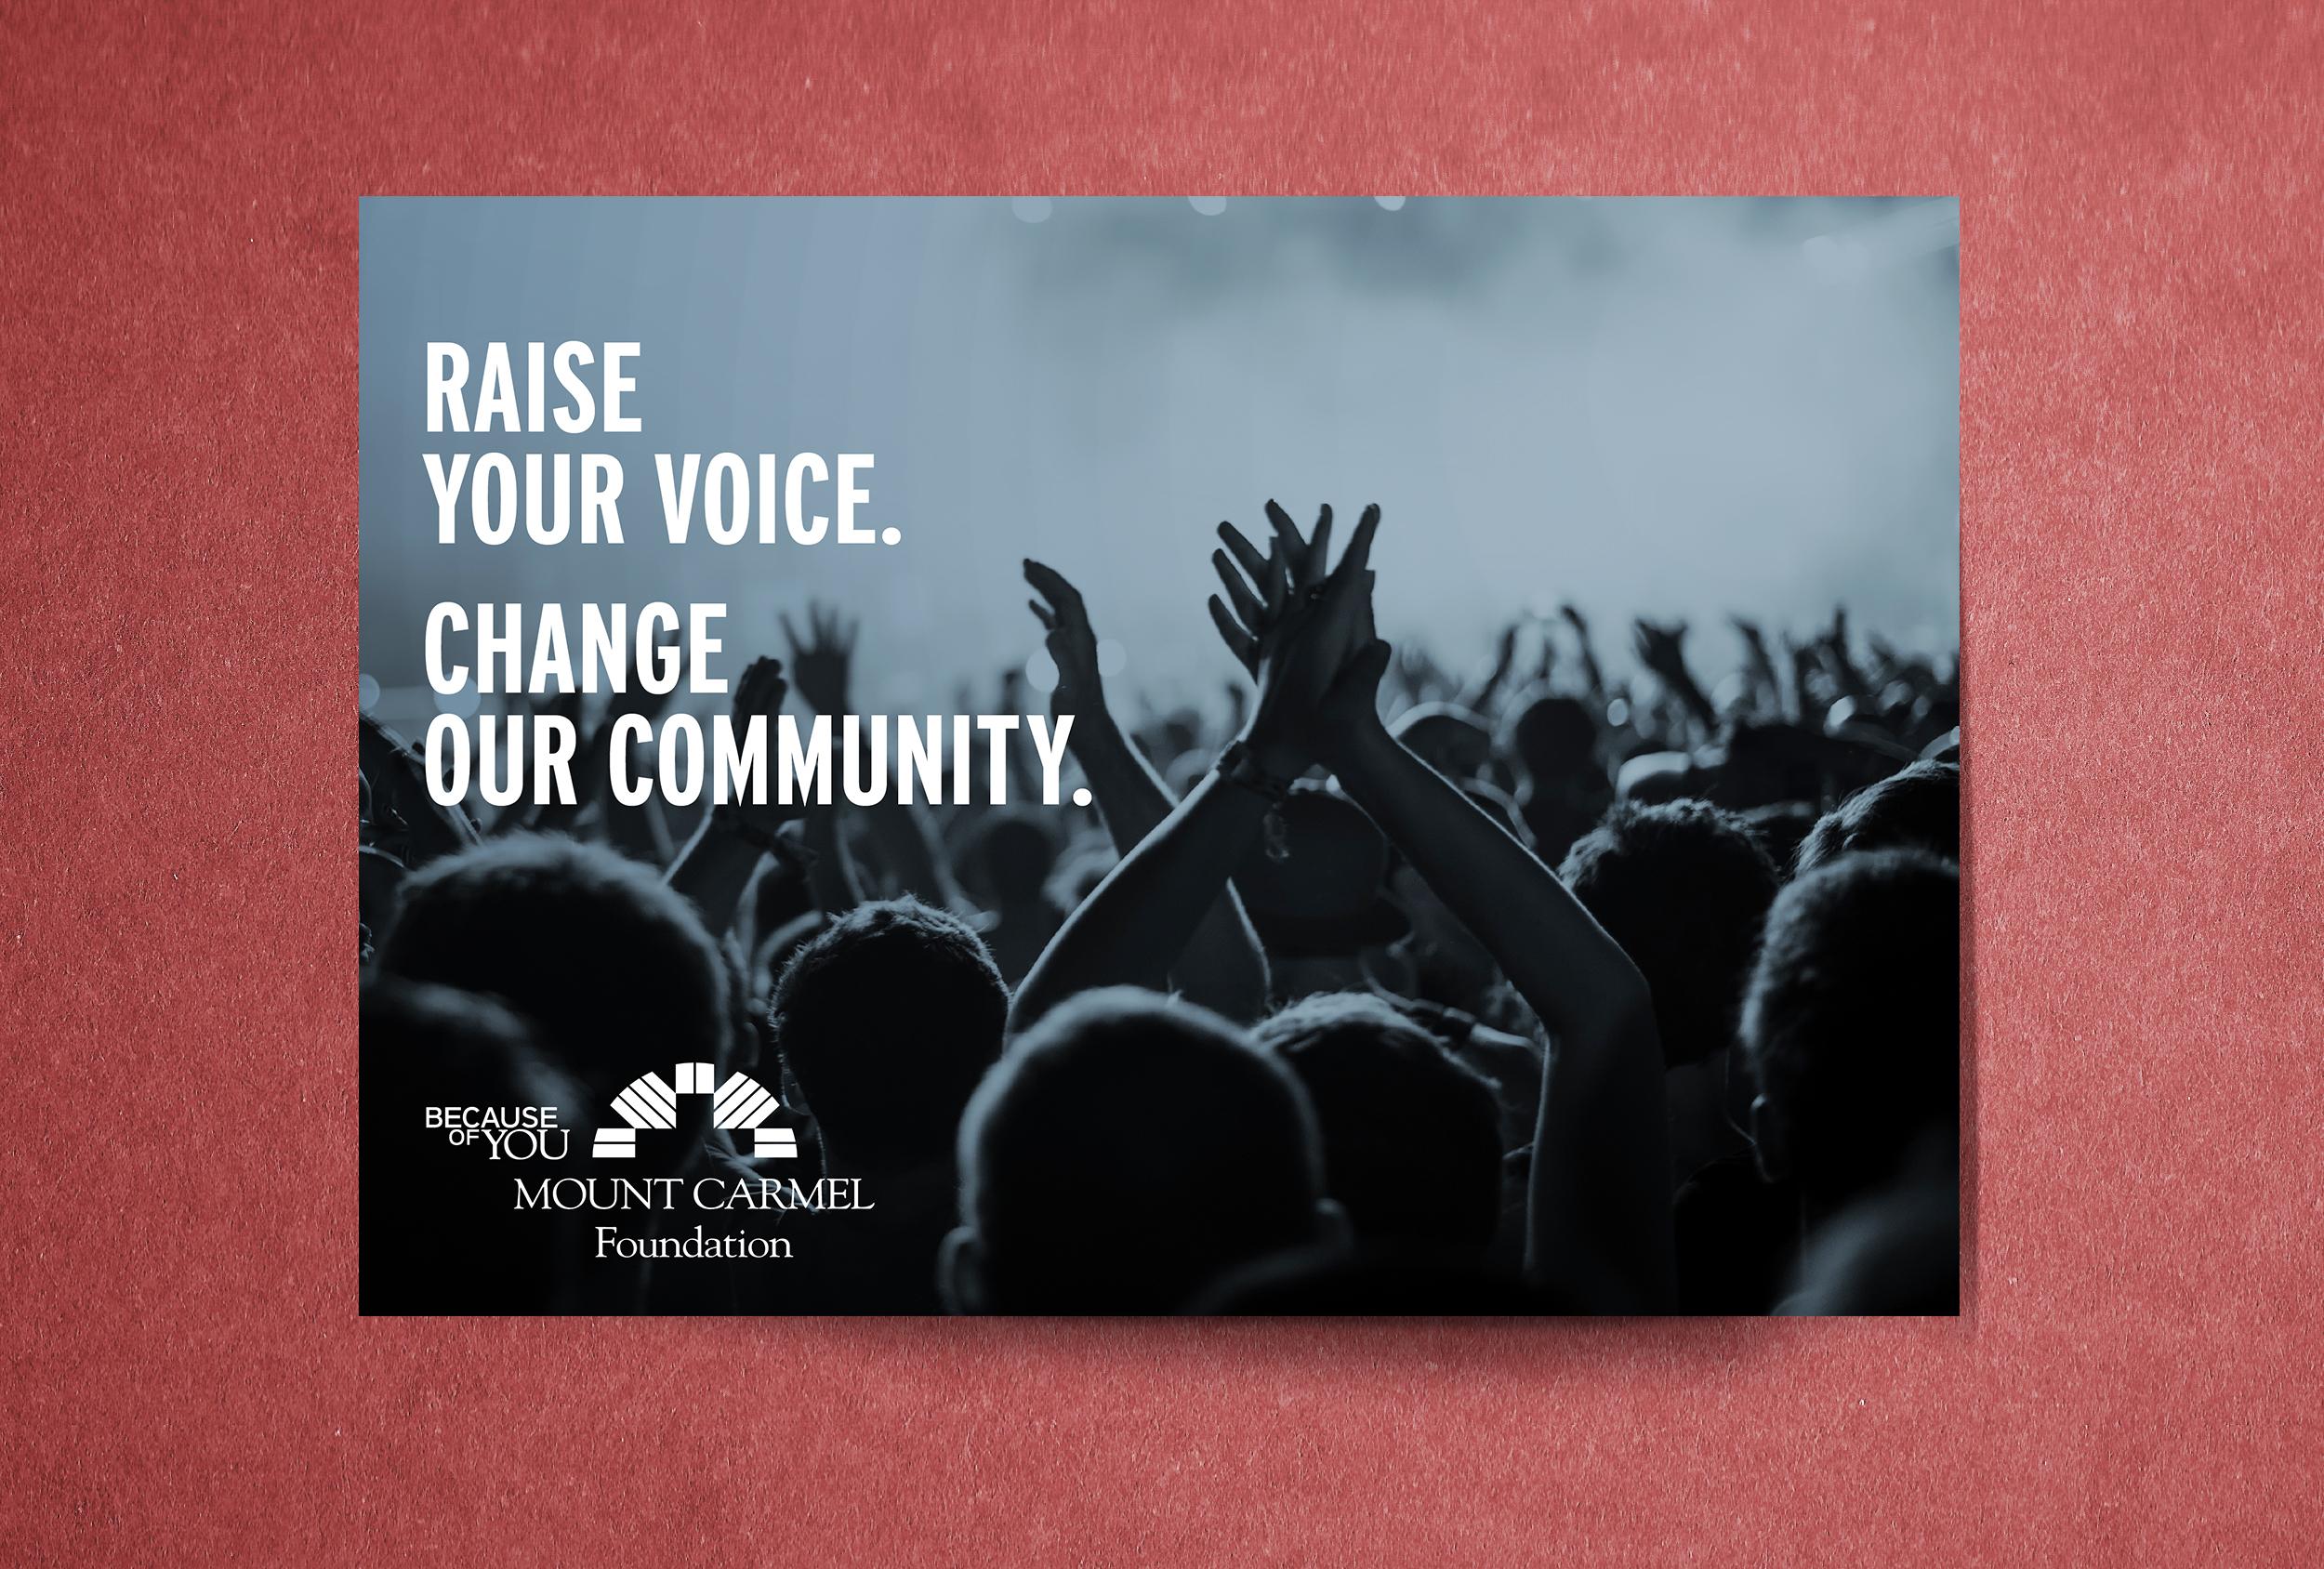 Raise-Your-Voice-Mount-Carmel.jpg